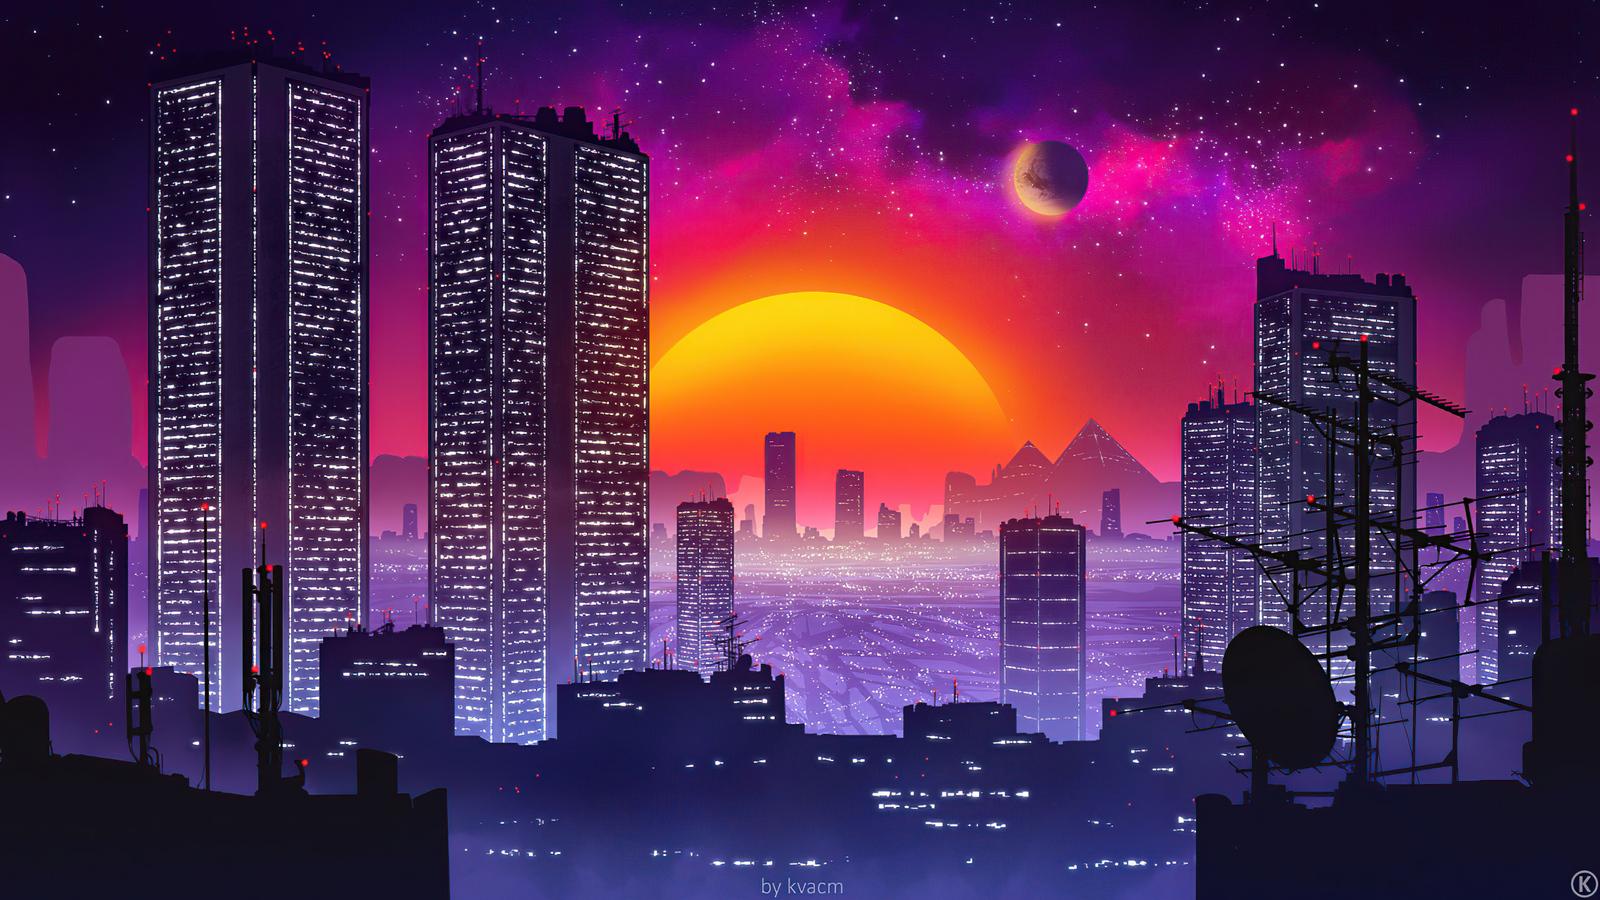 city-retrowave-sunset-5k-d8.jpg